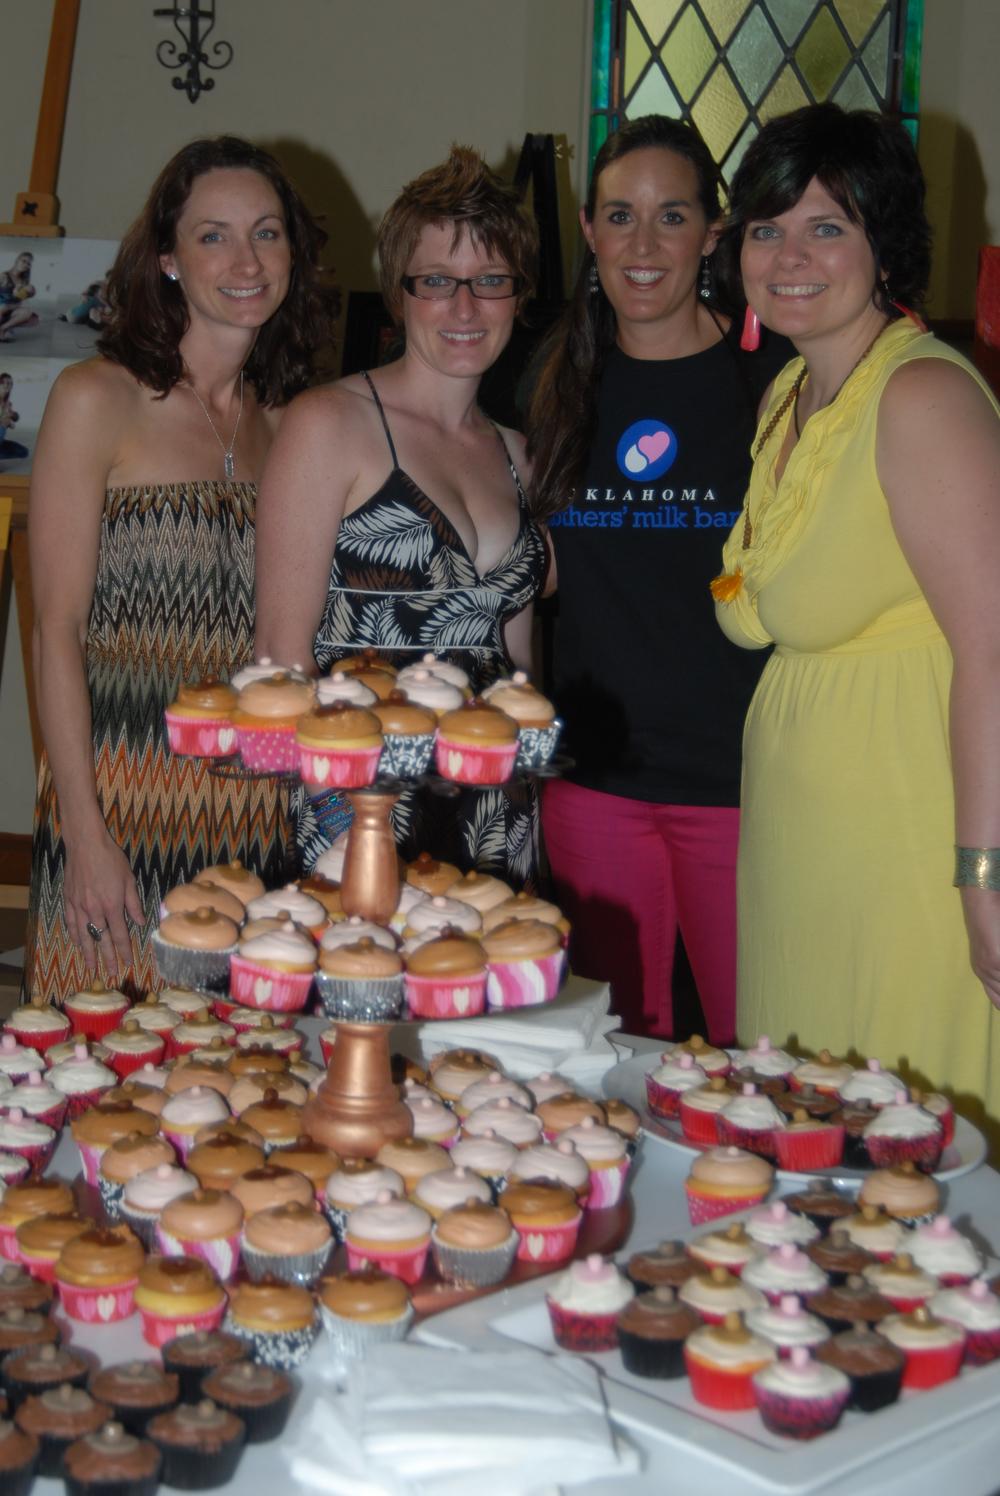 Keri Boone, Brittany Fitzgerald, Keri Hale, Deanna Norris